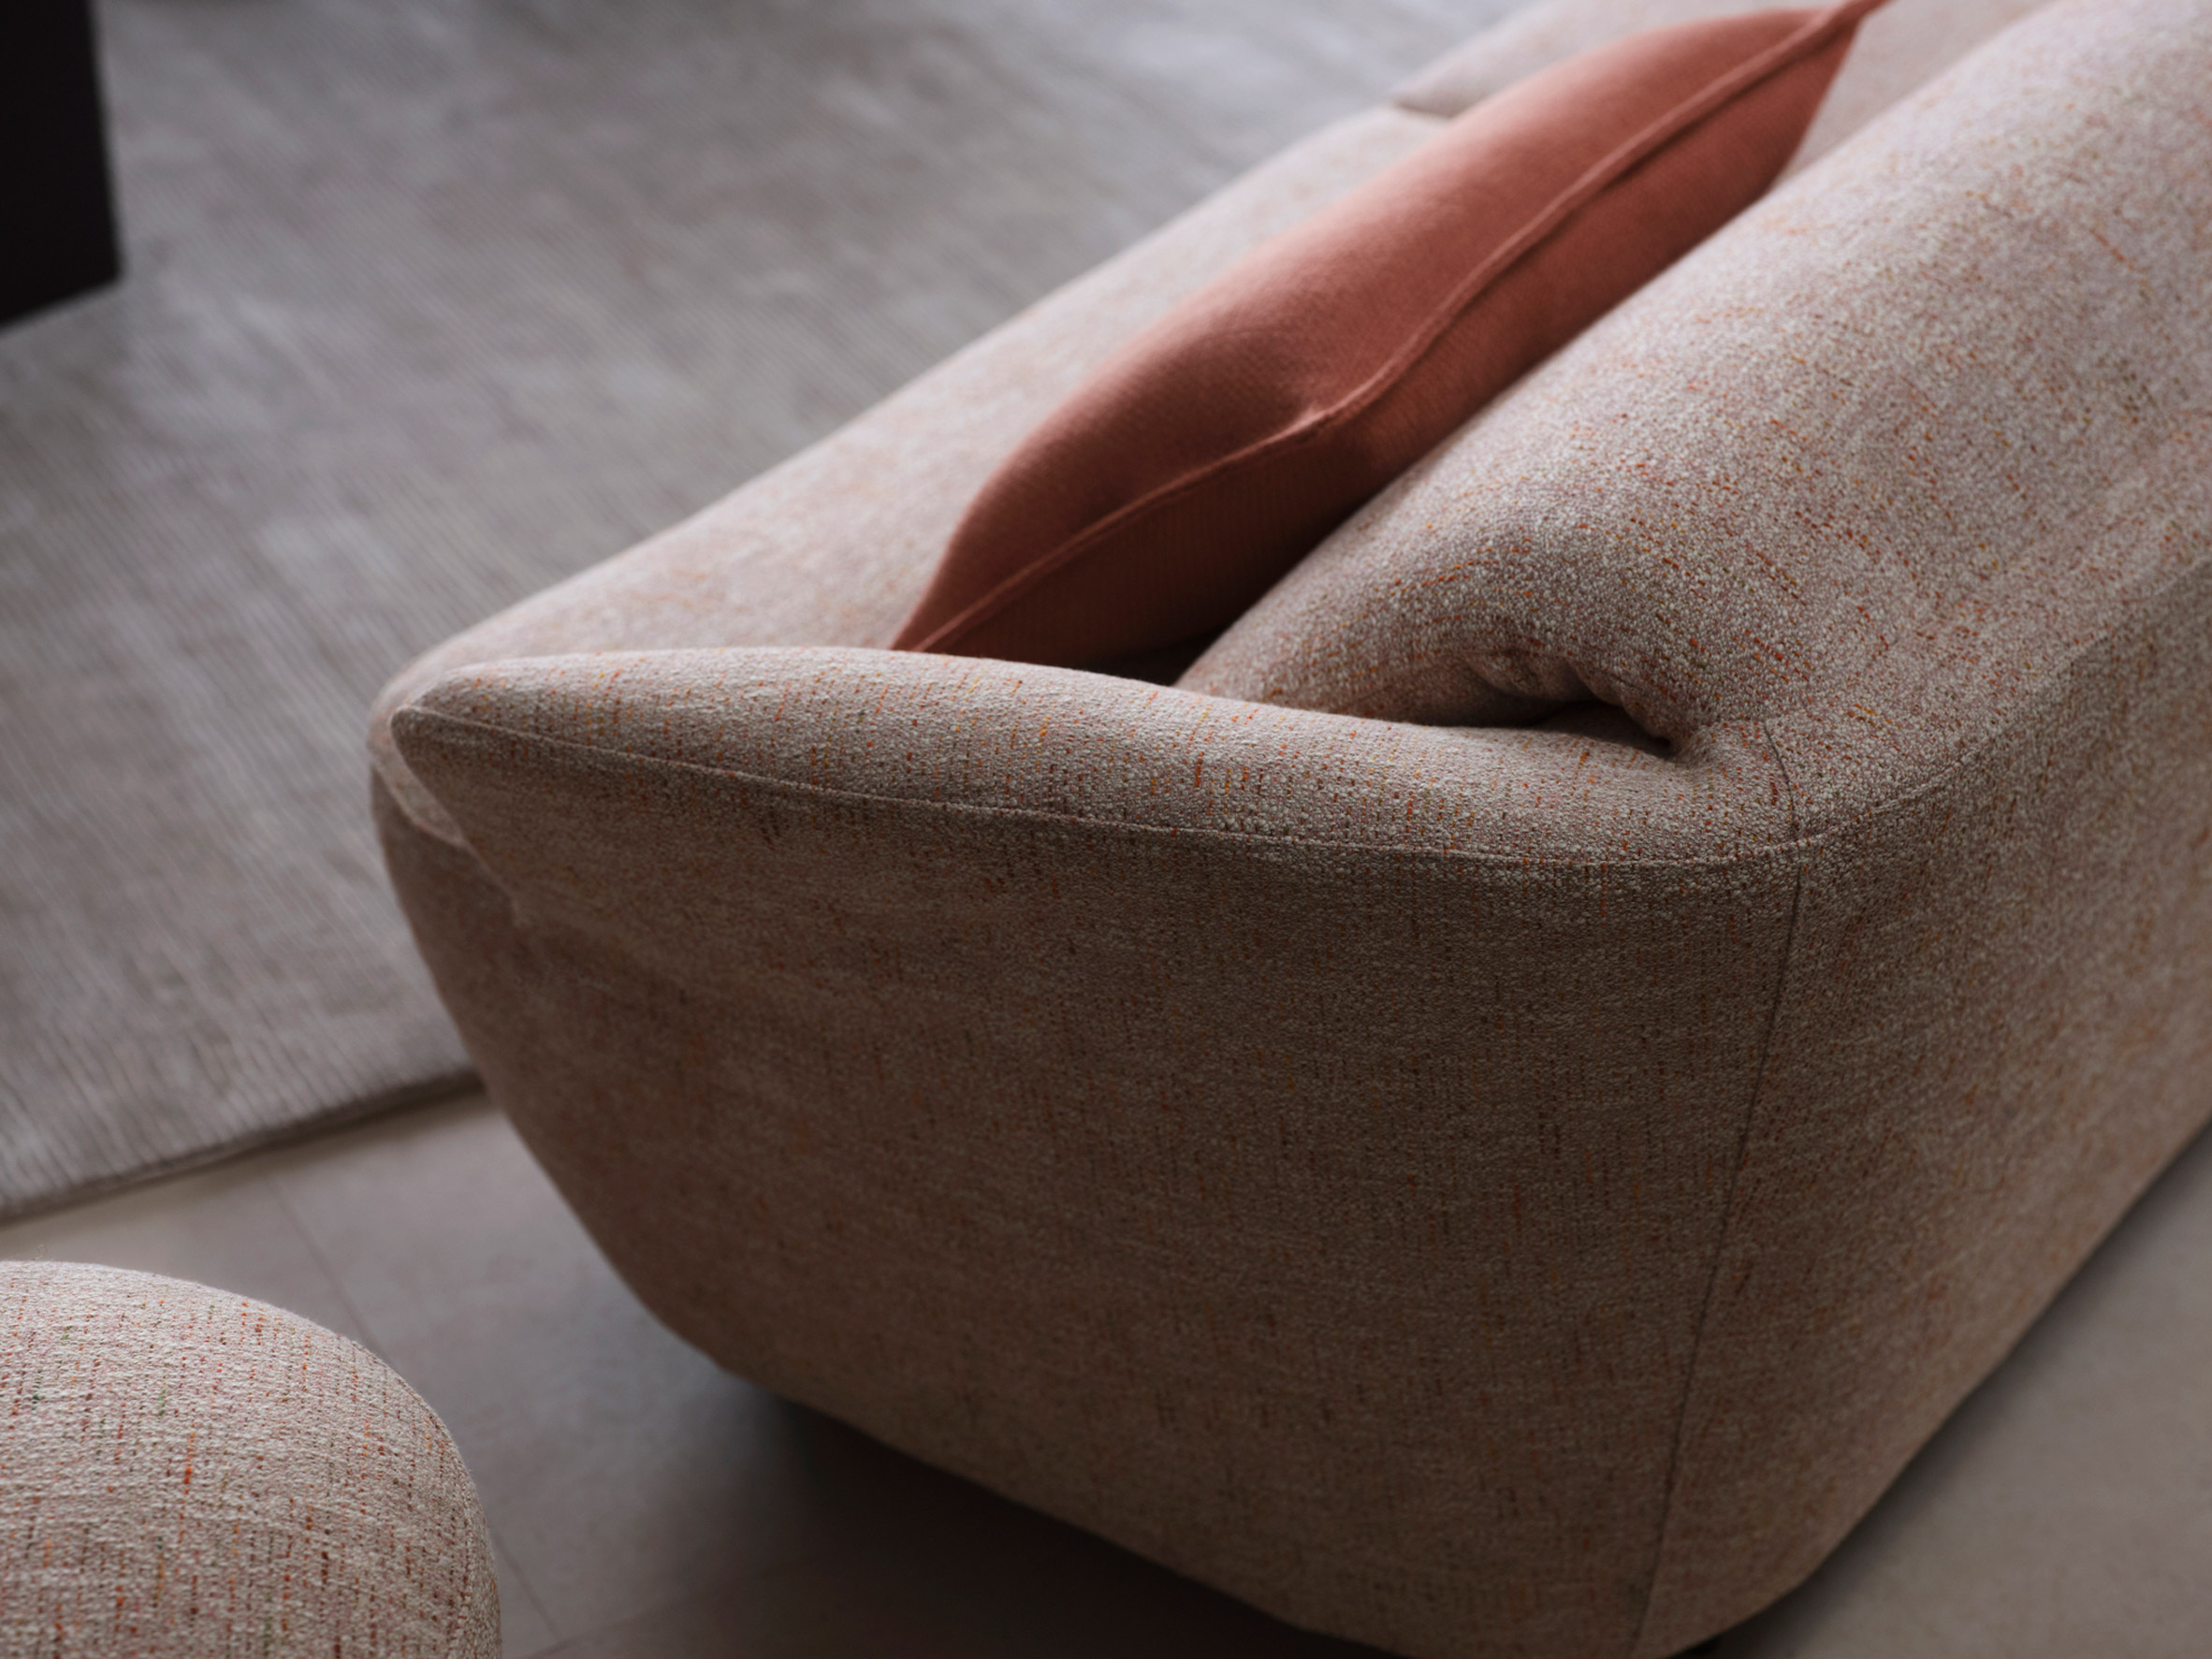 Folded backrest on the Fleur sofa by King Living